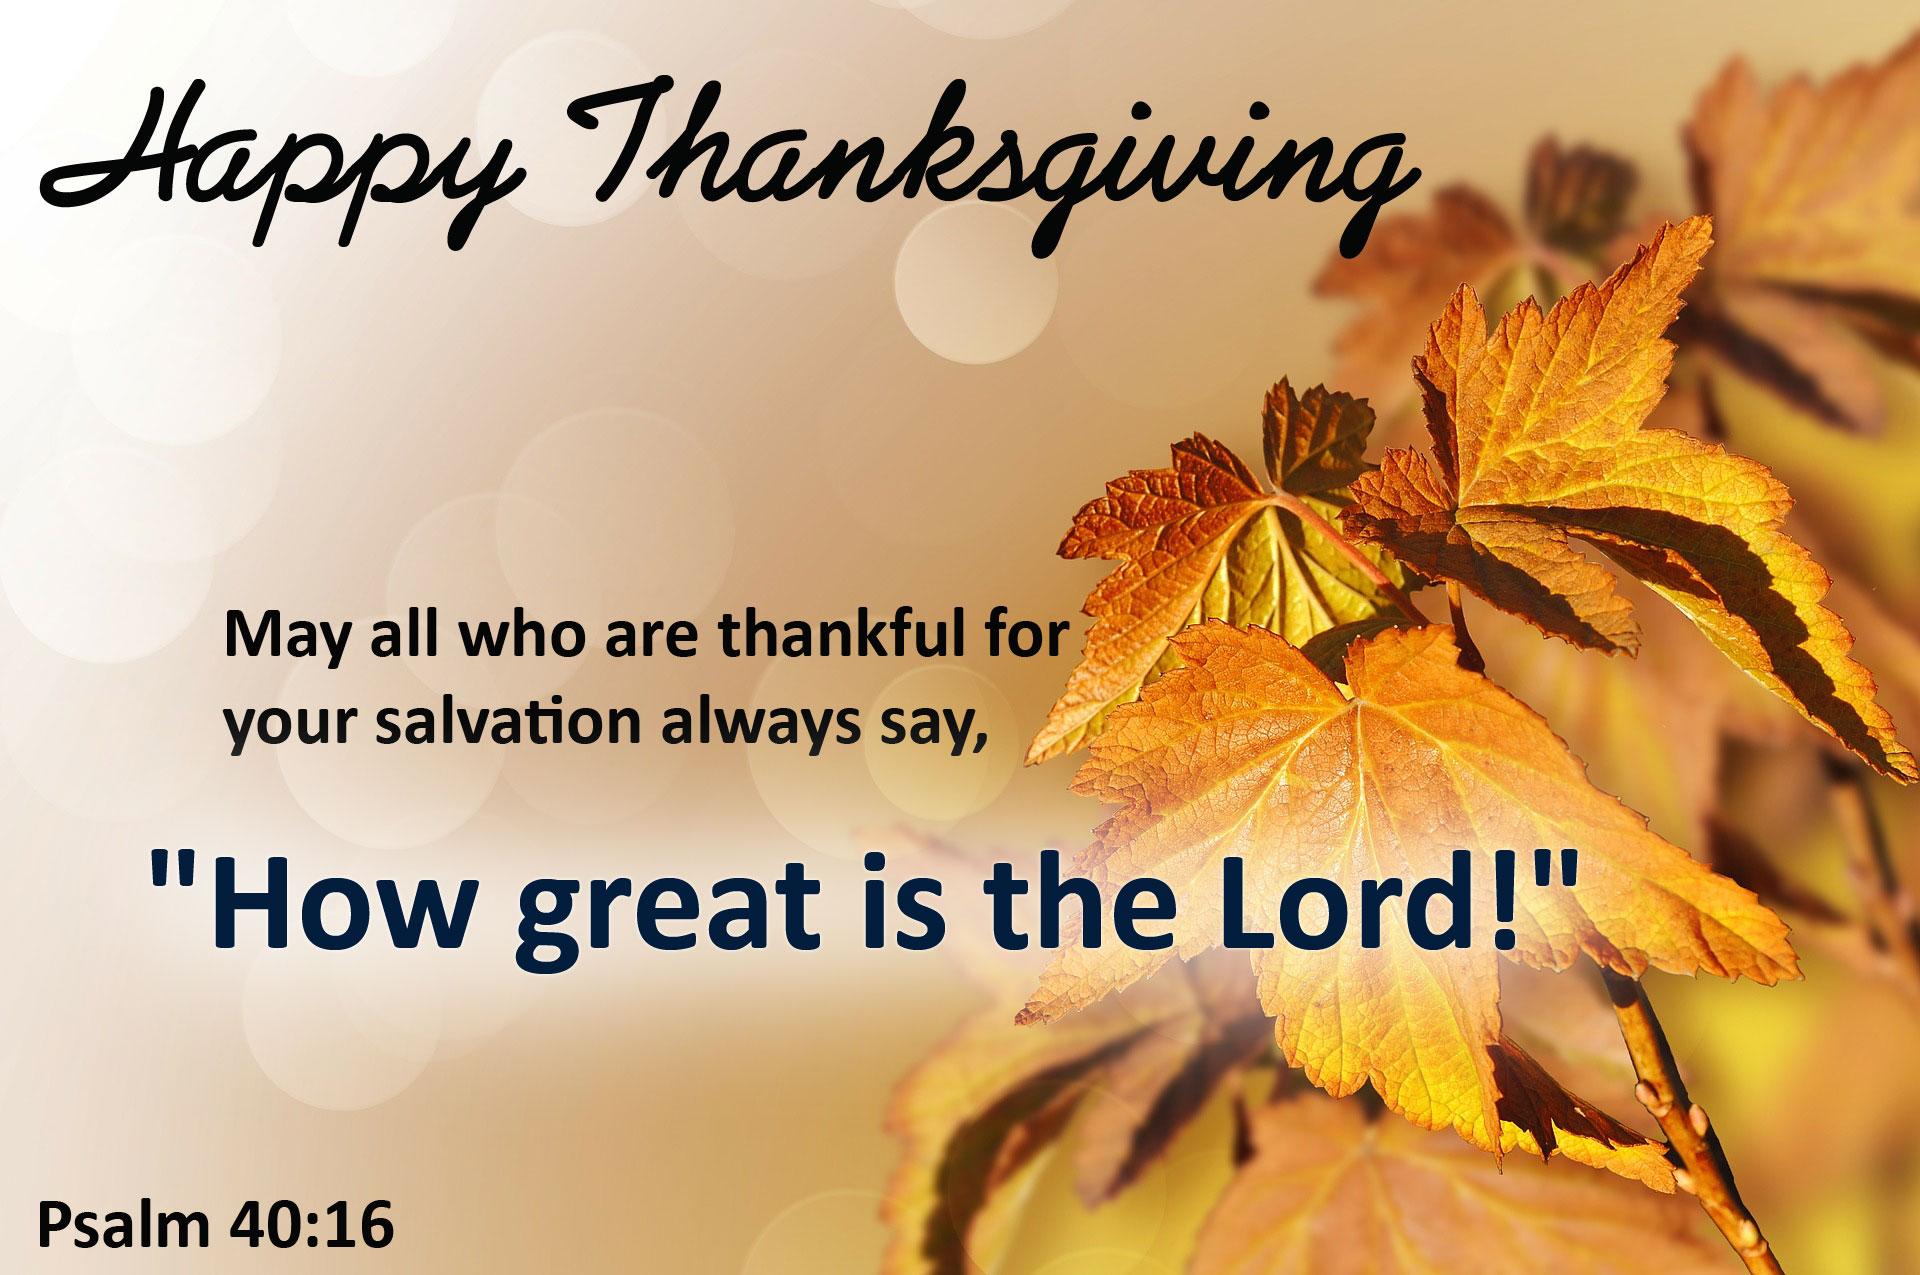 thanksgiving2014 1920x1275